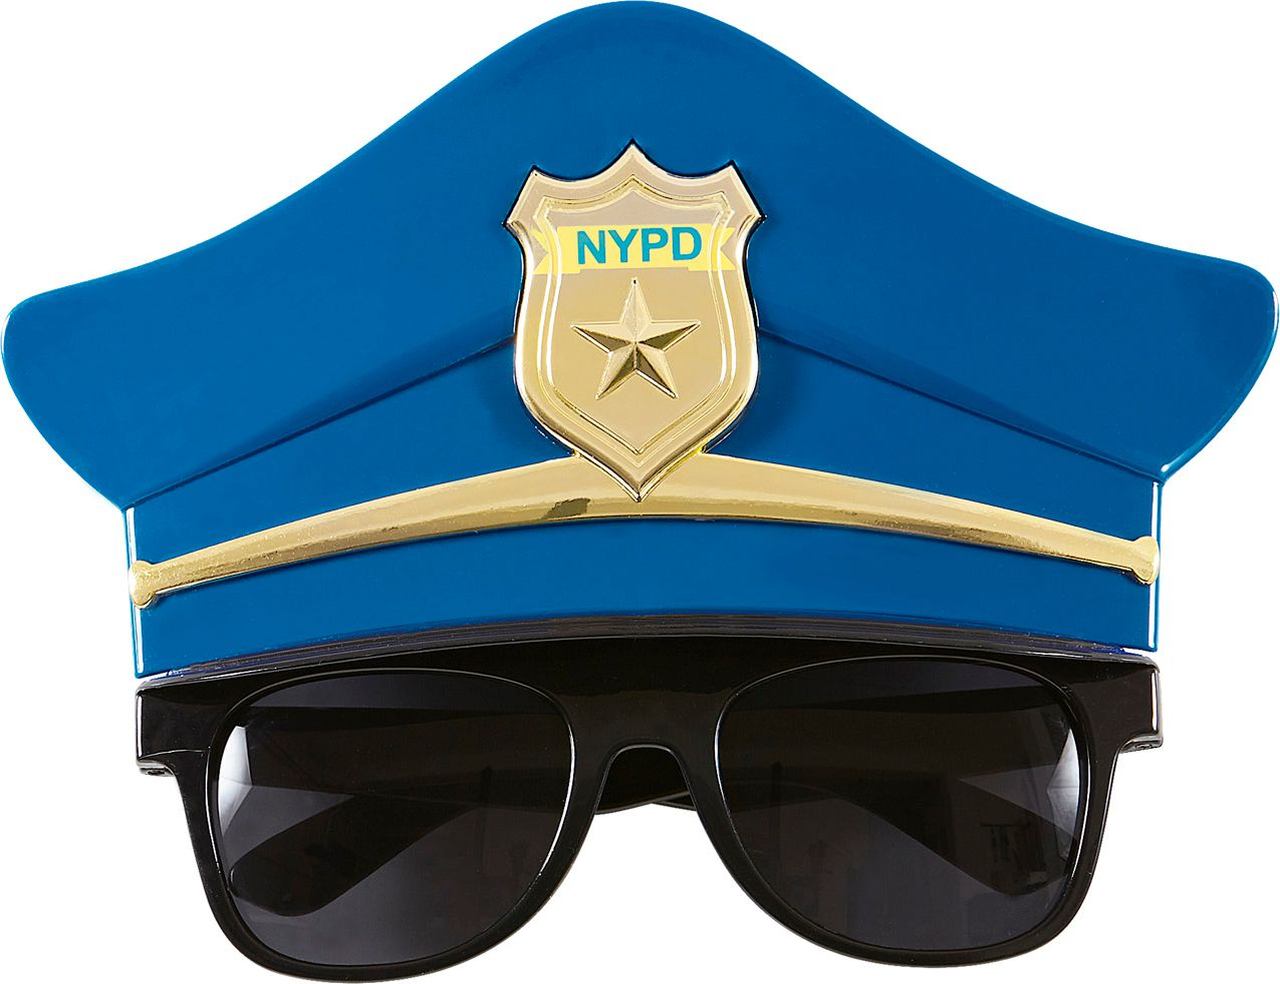 Politiepet bril